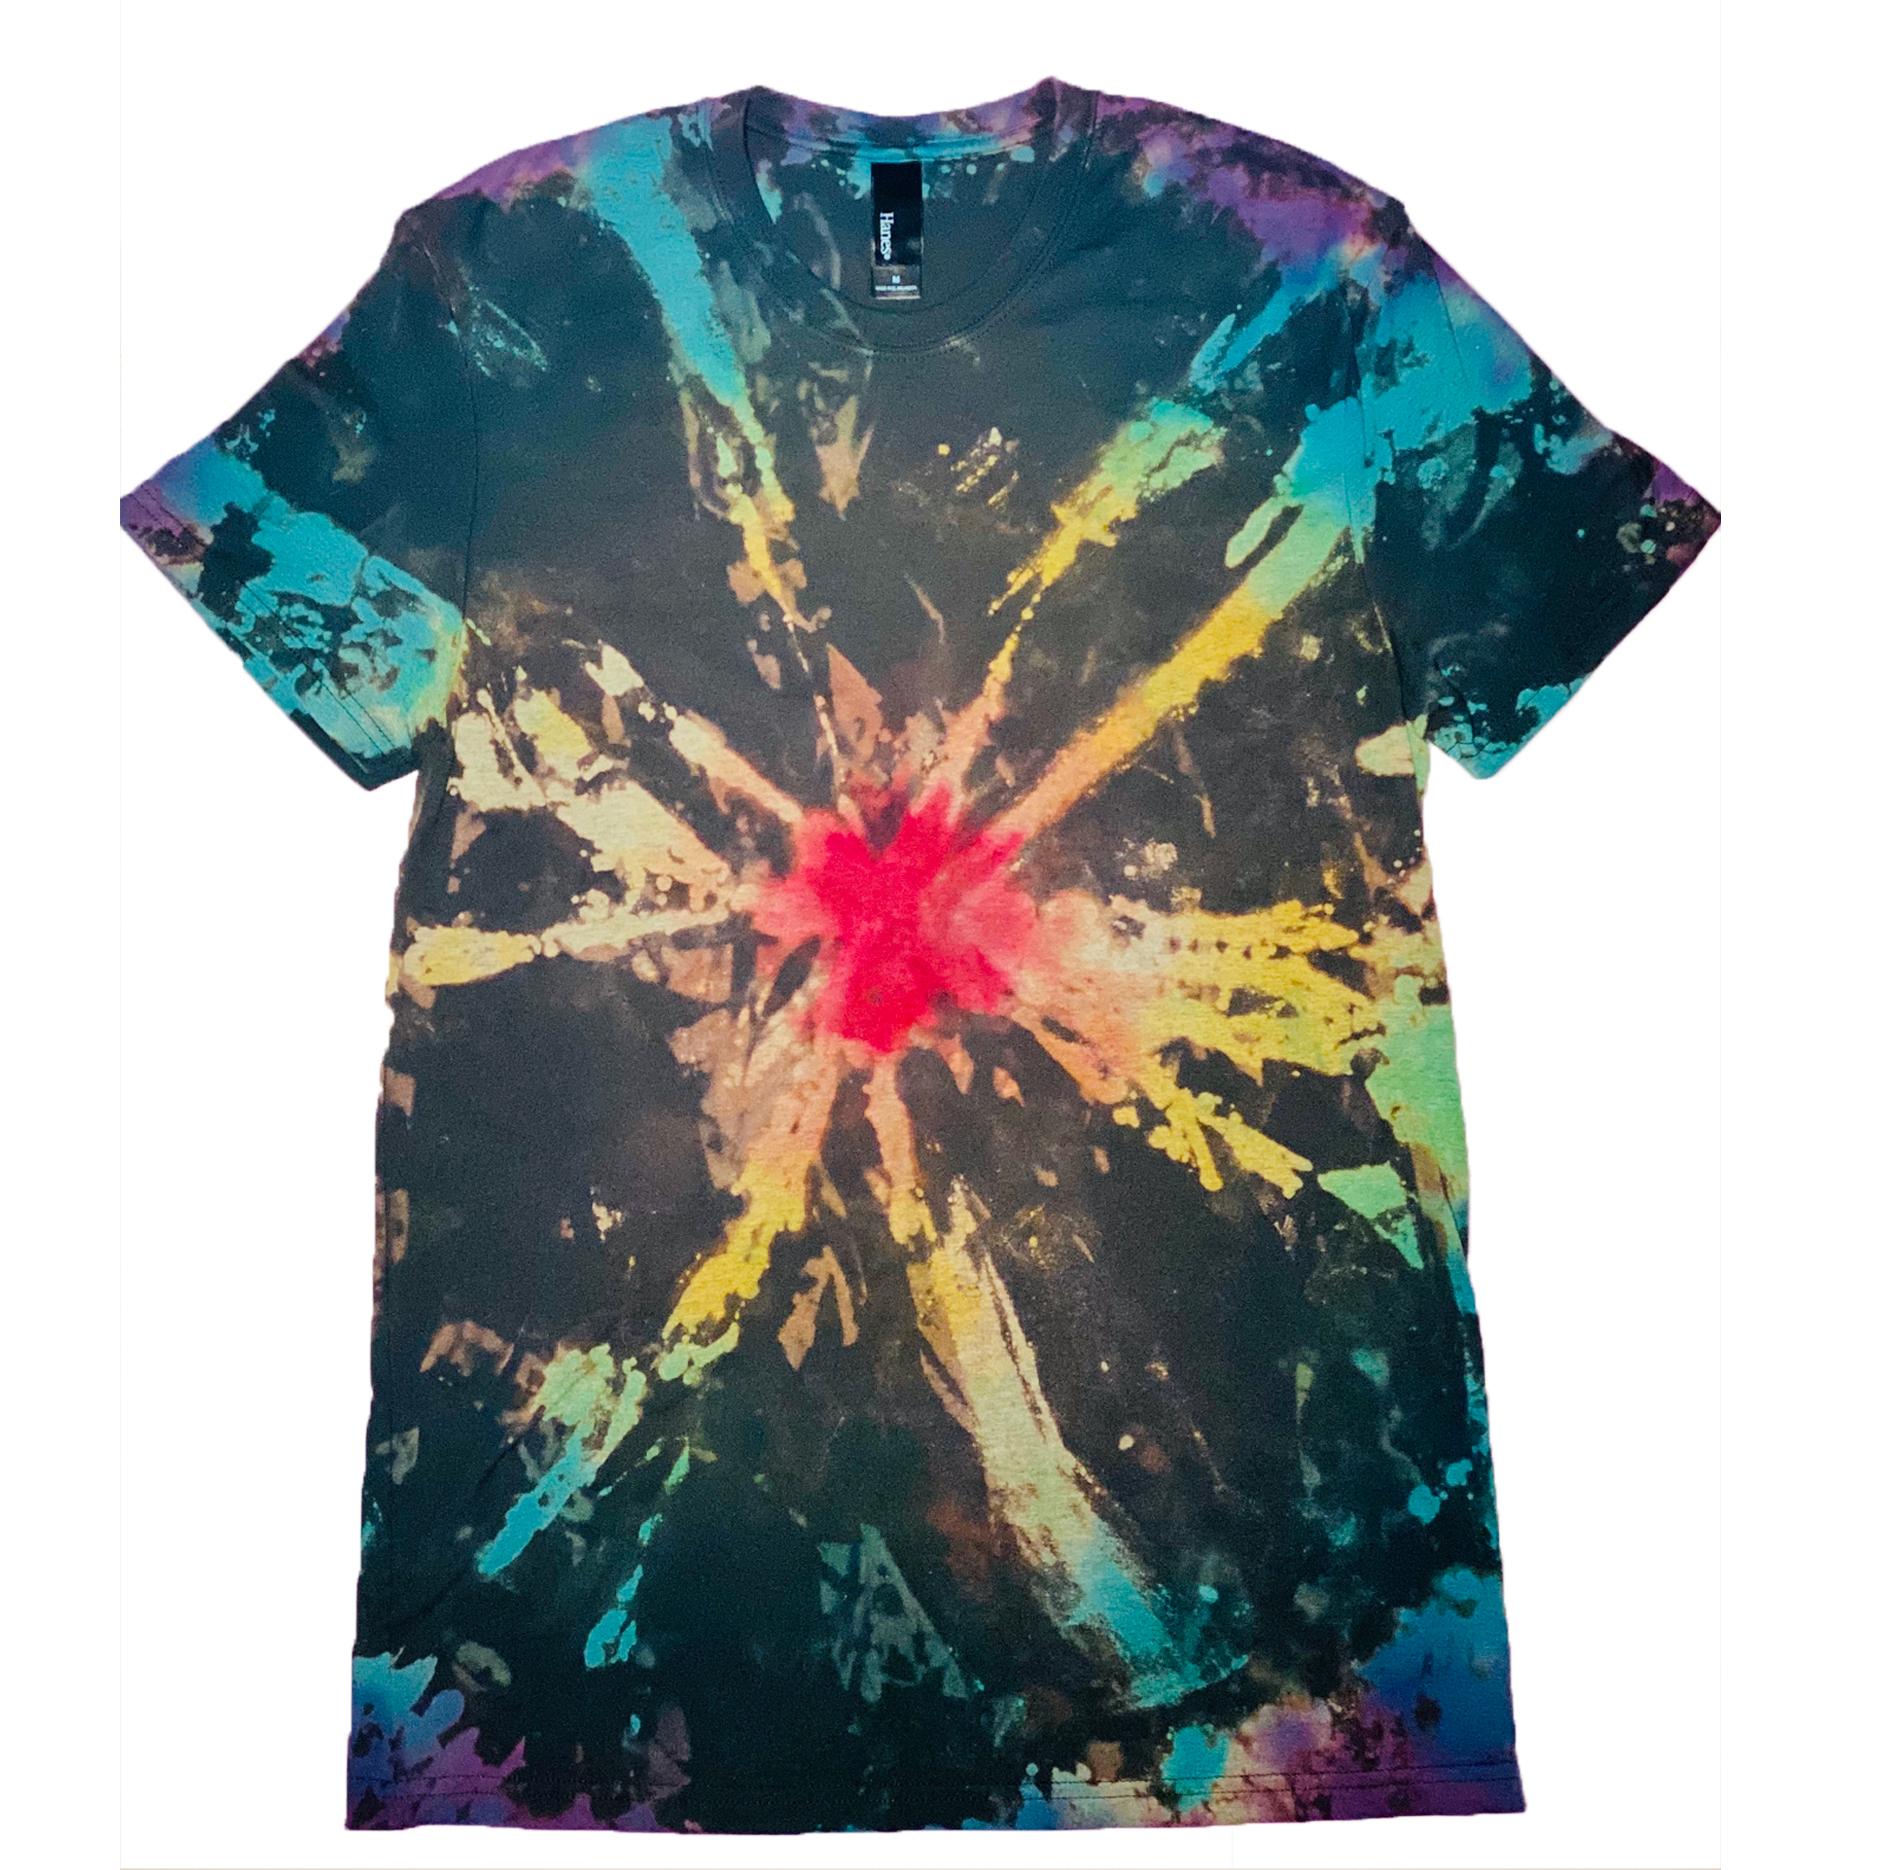 Reverse Tie Dye Long Sleeve Graphic Tshirt